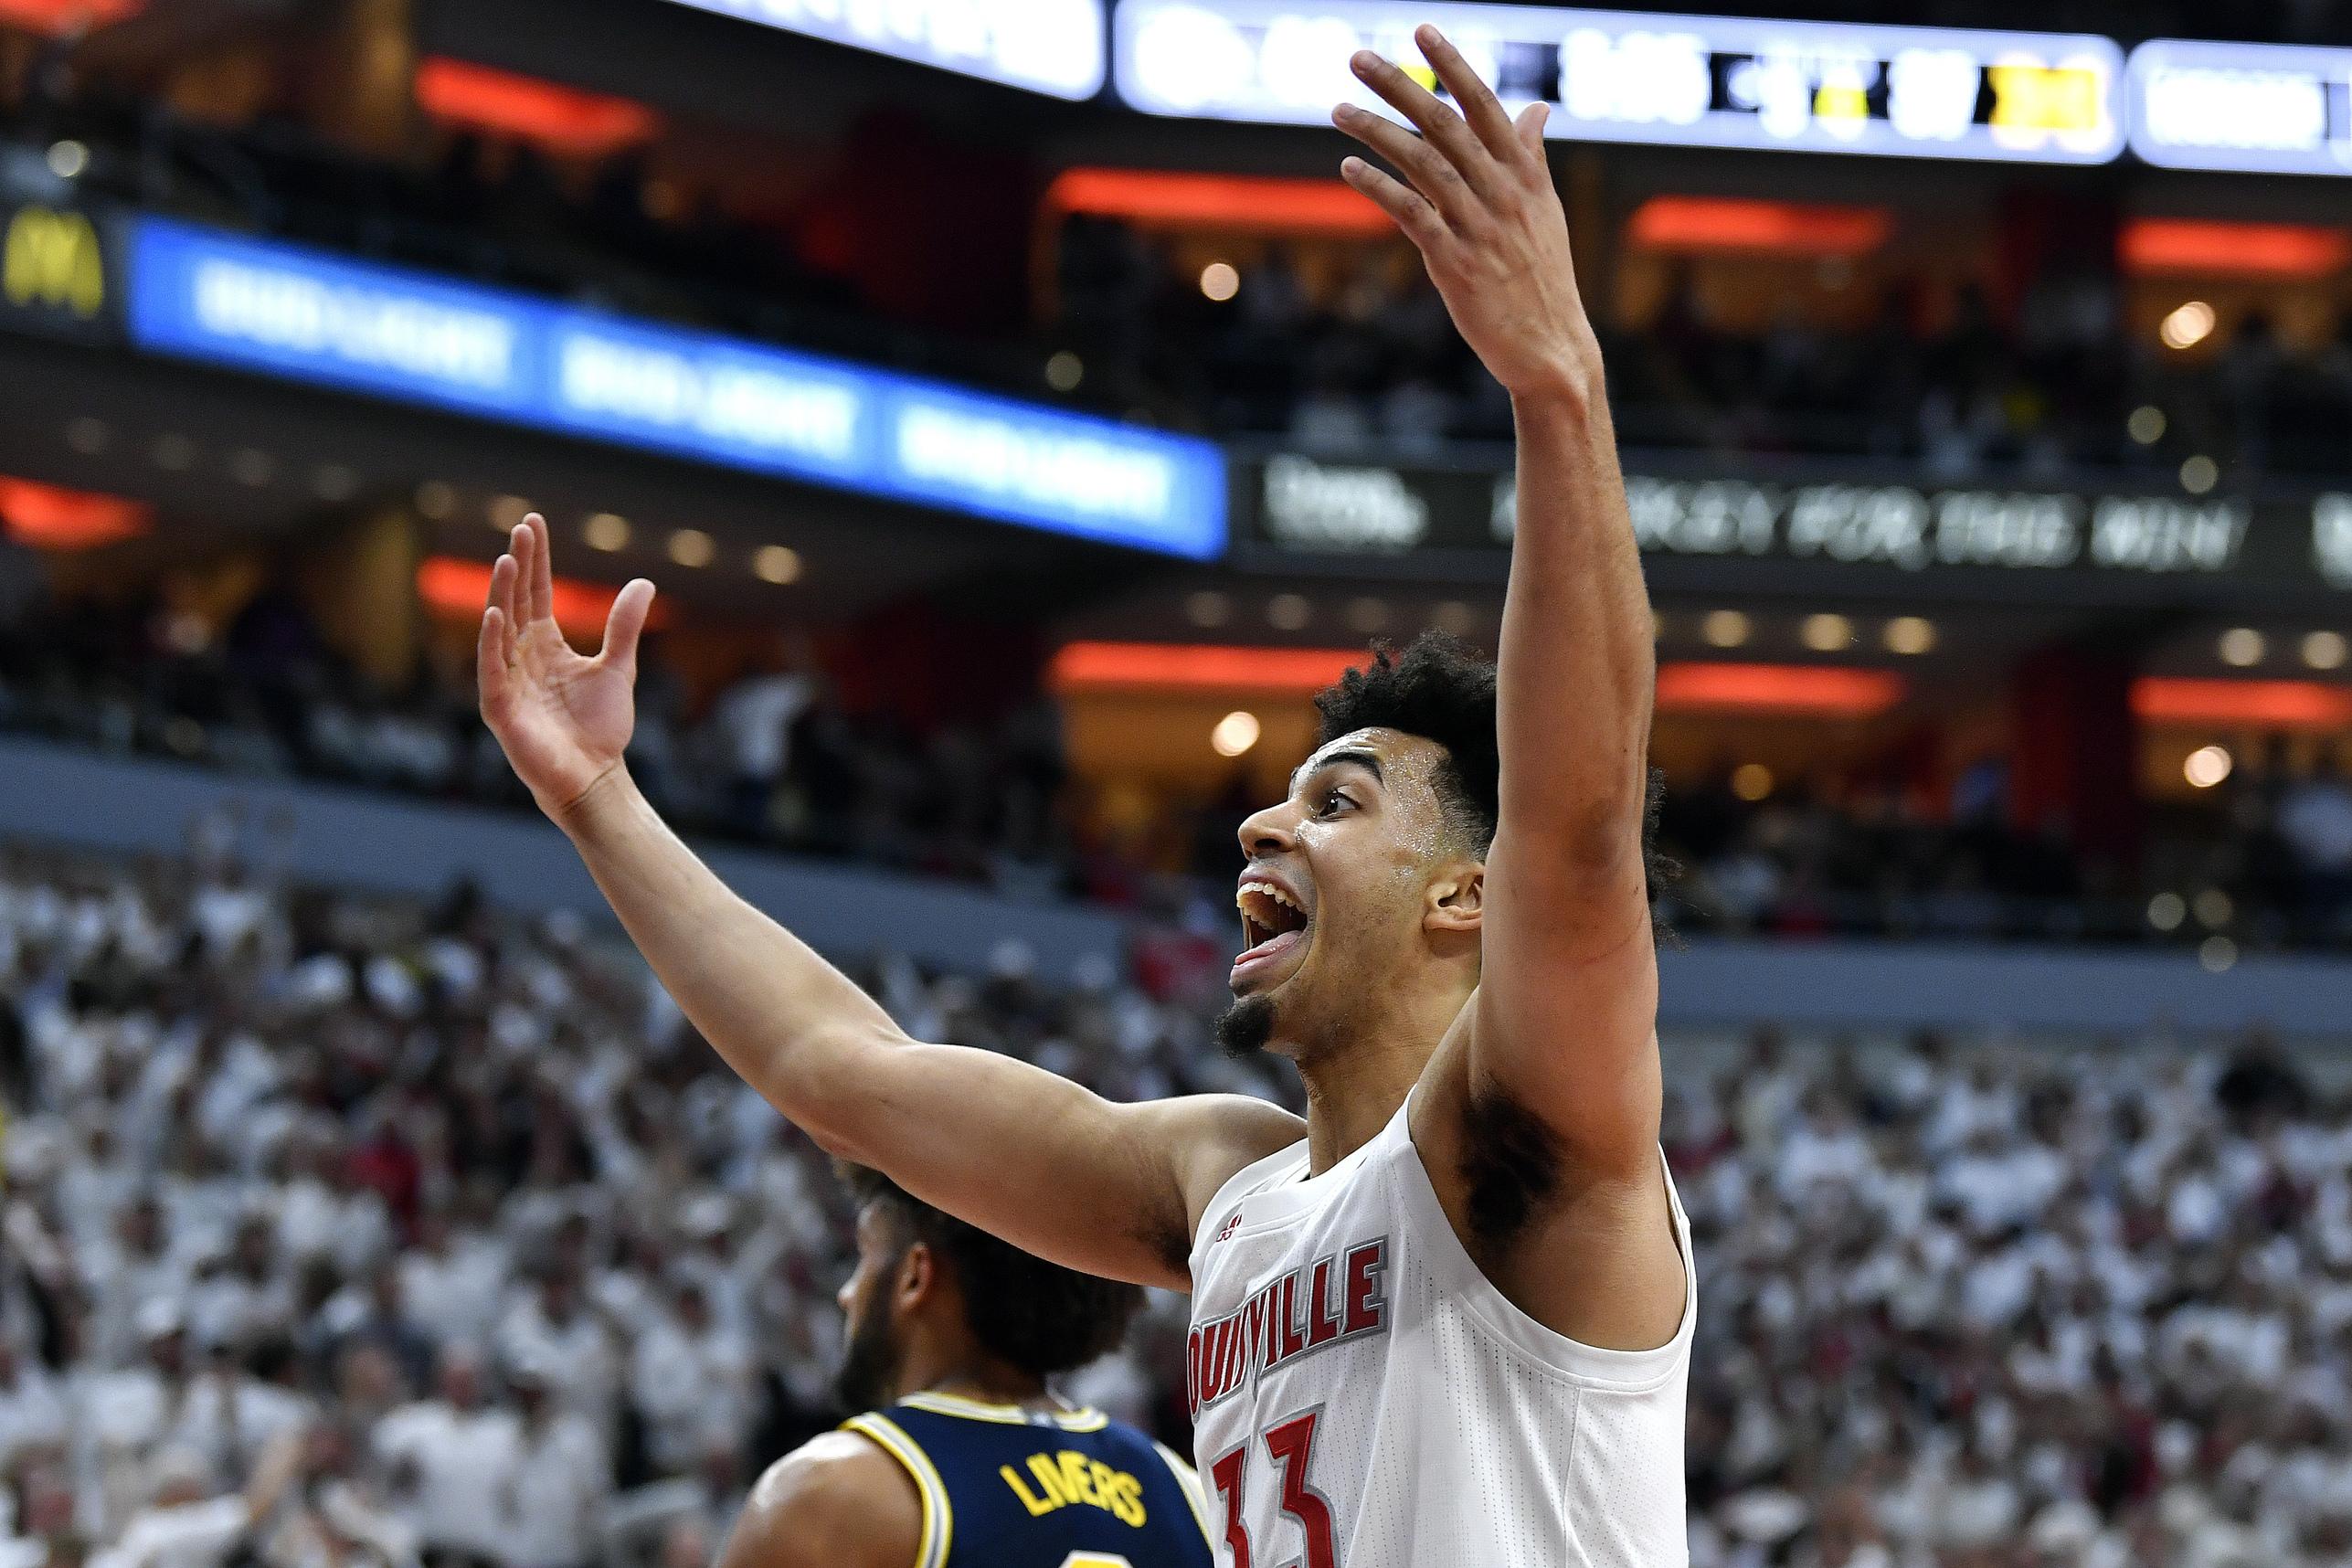 New AP men's top 25 basketball poll: How far has North Carolina fallen?